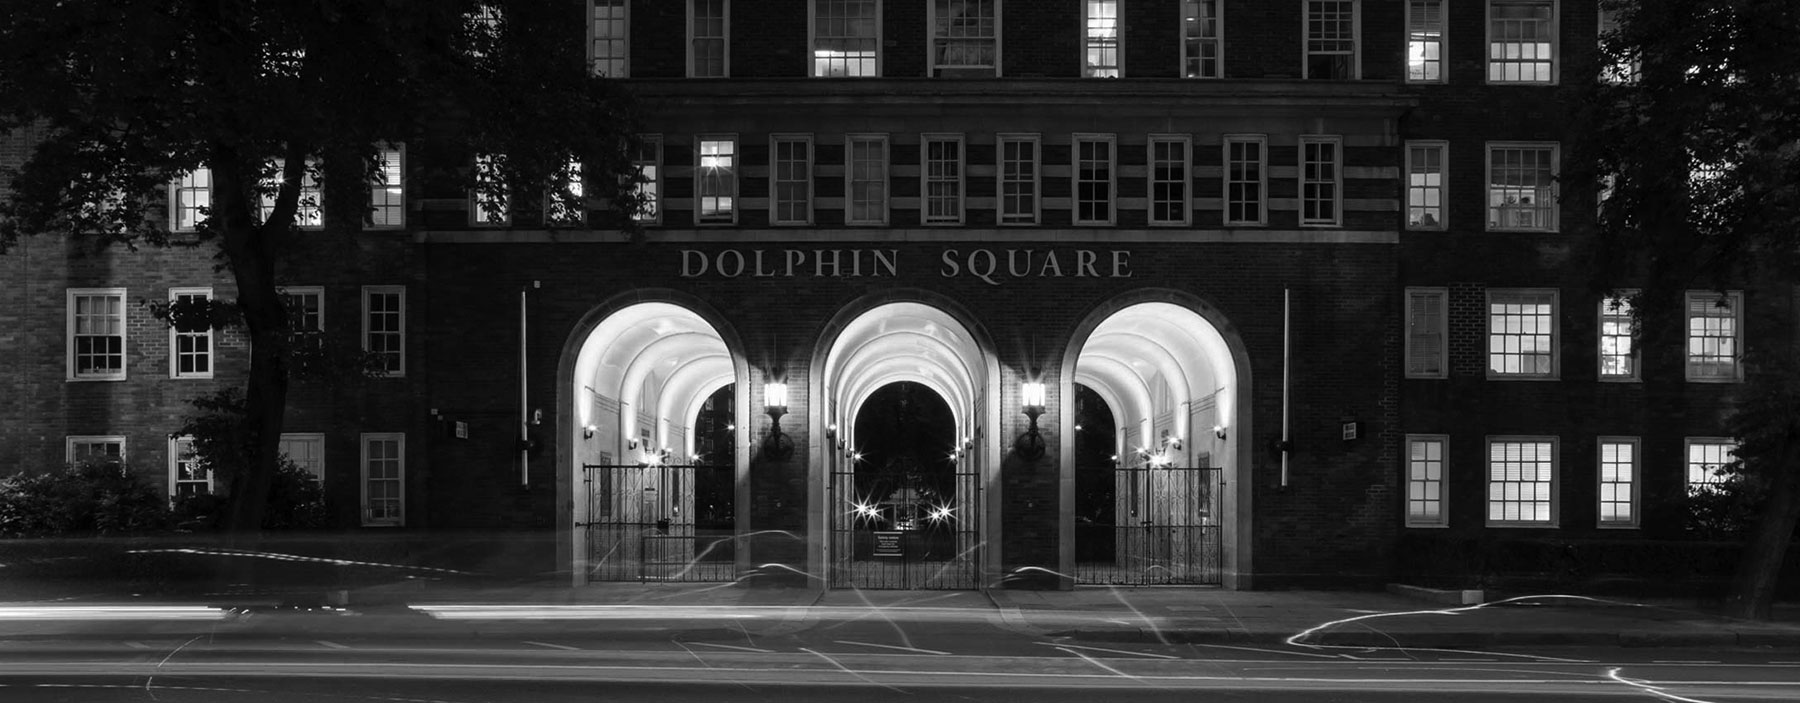 Dolphin-Square-Ltd-Corporate-Information-1